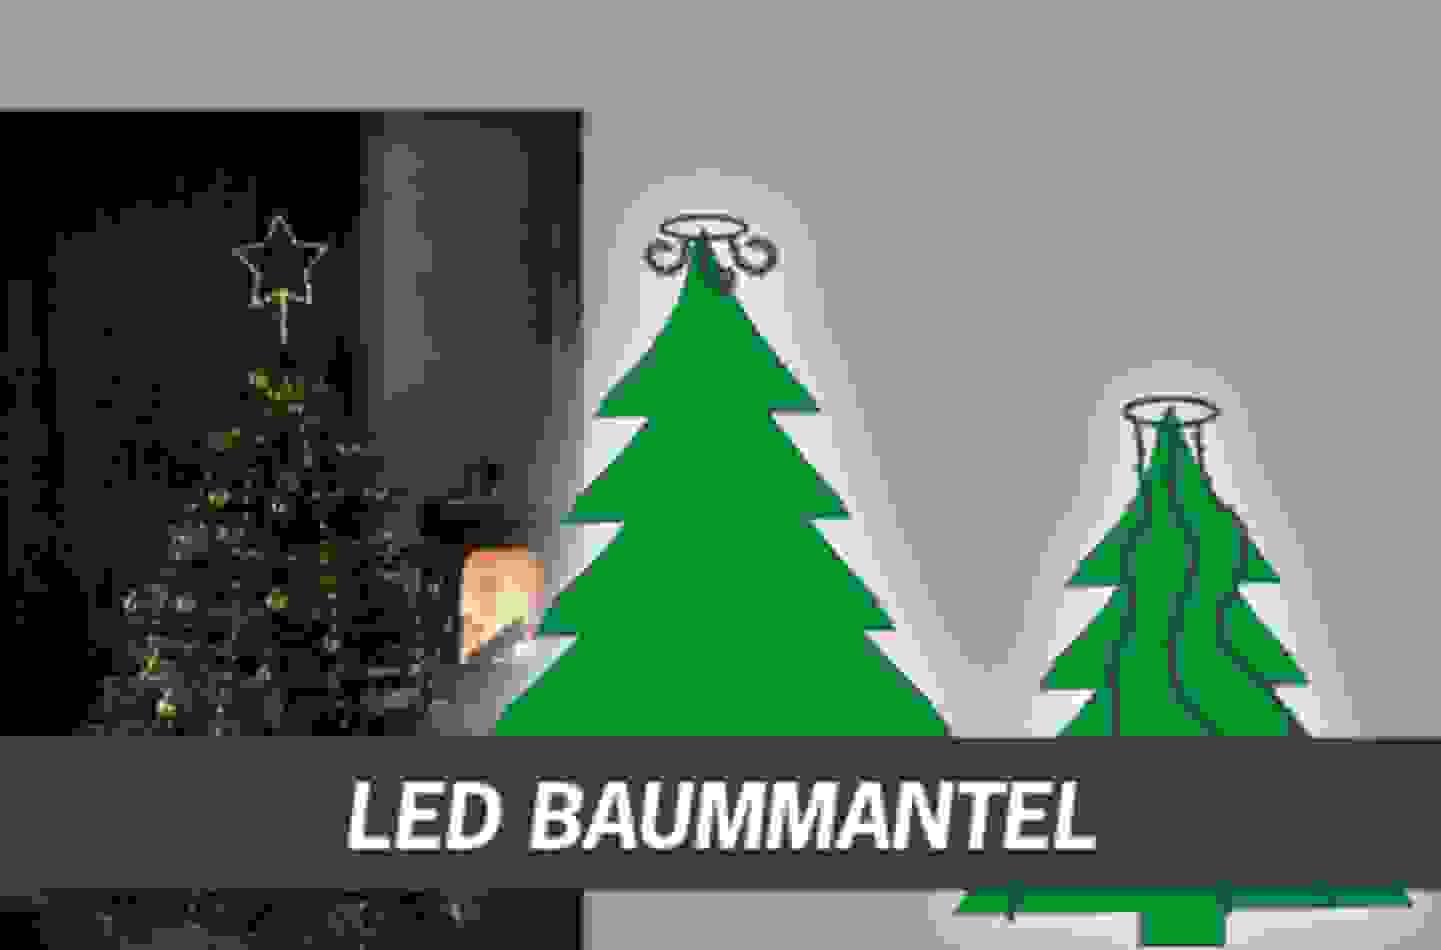 LED Baummantel